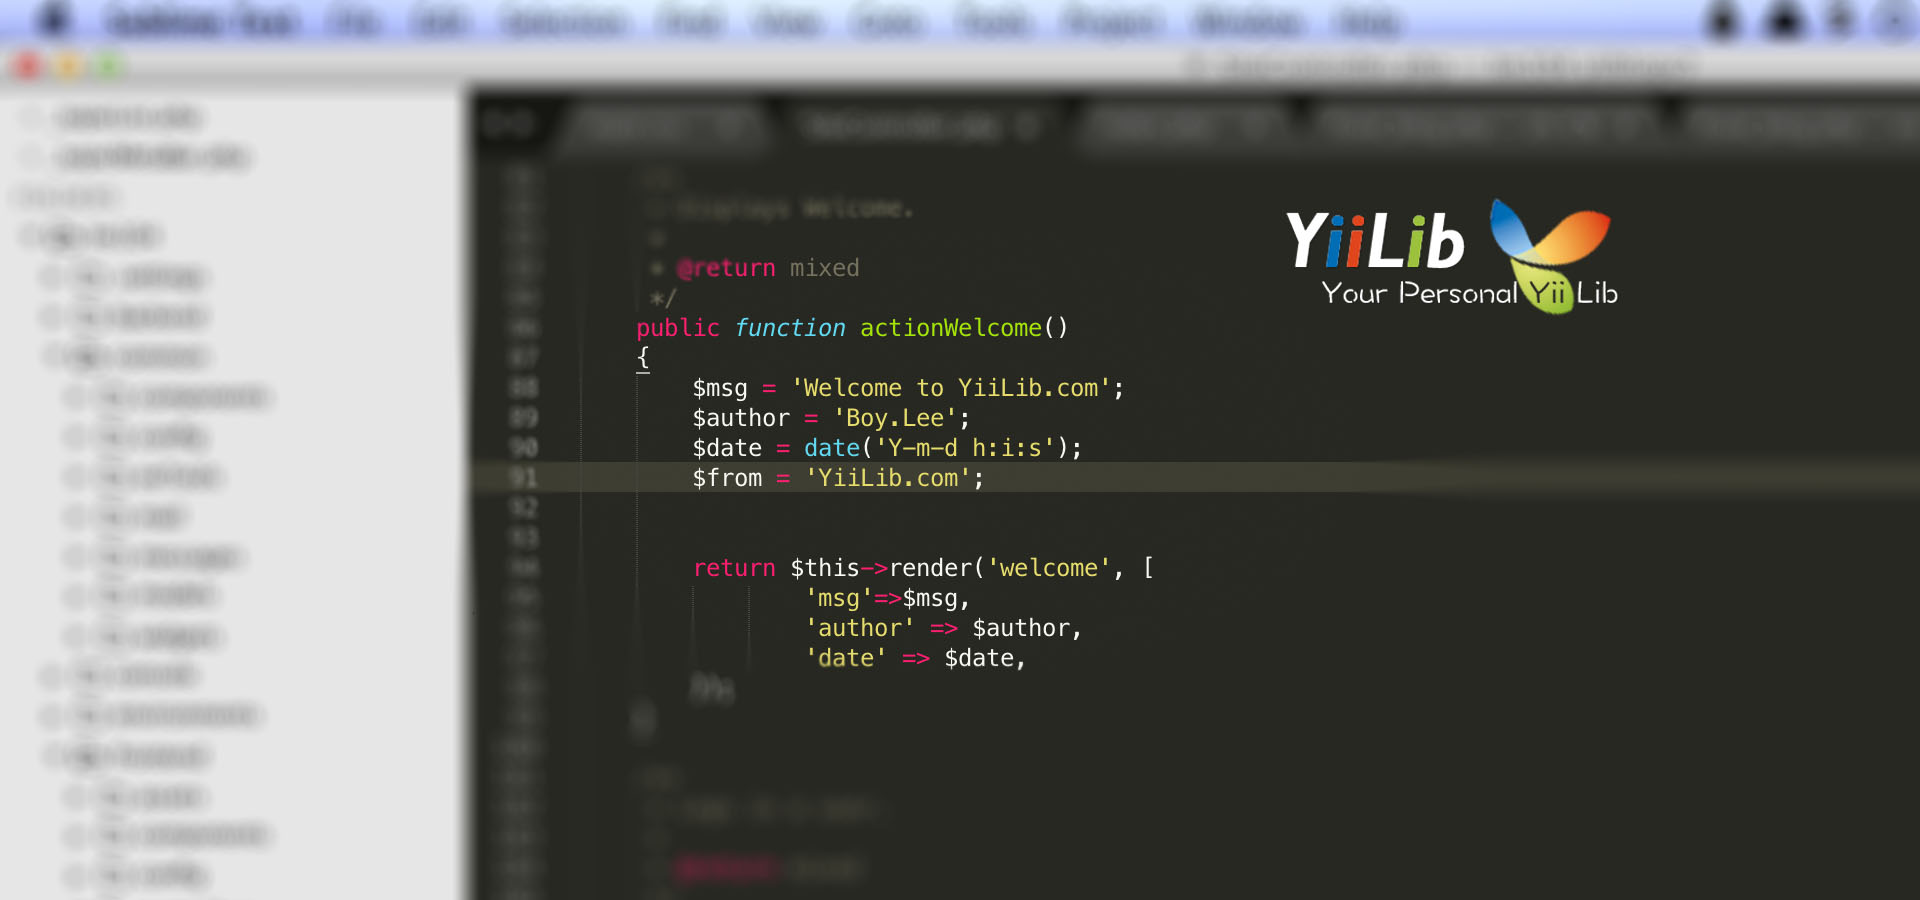 New YiiLib.com online